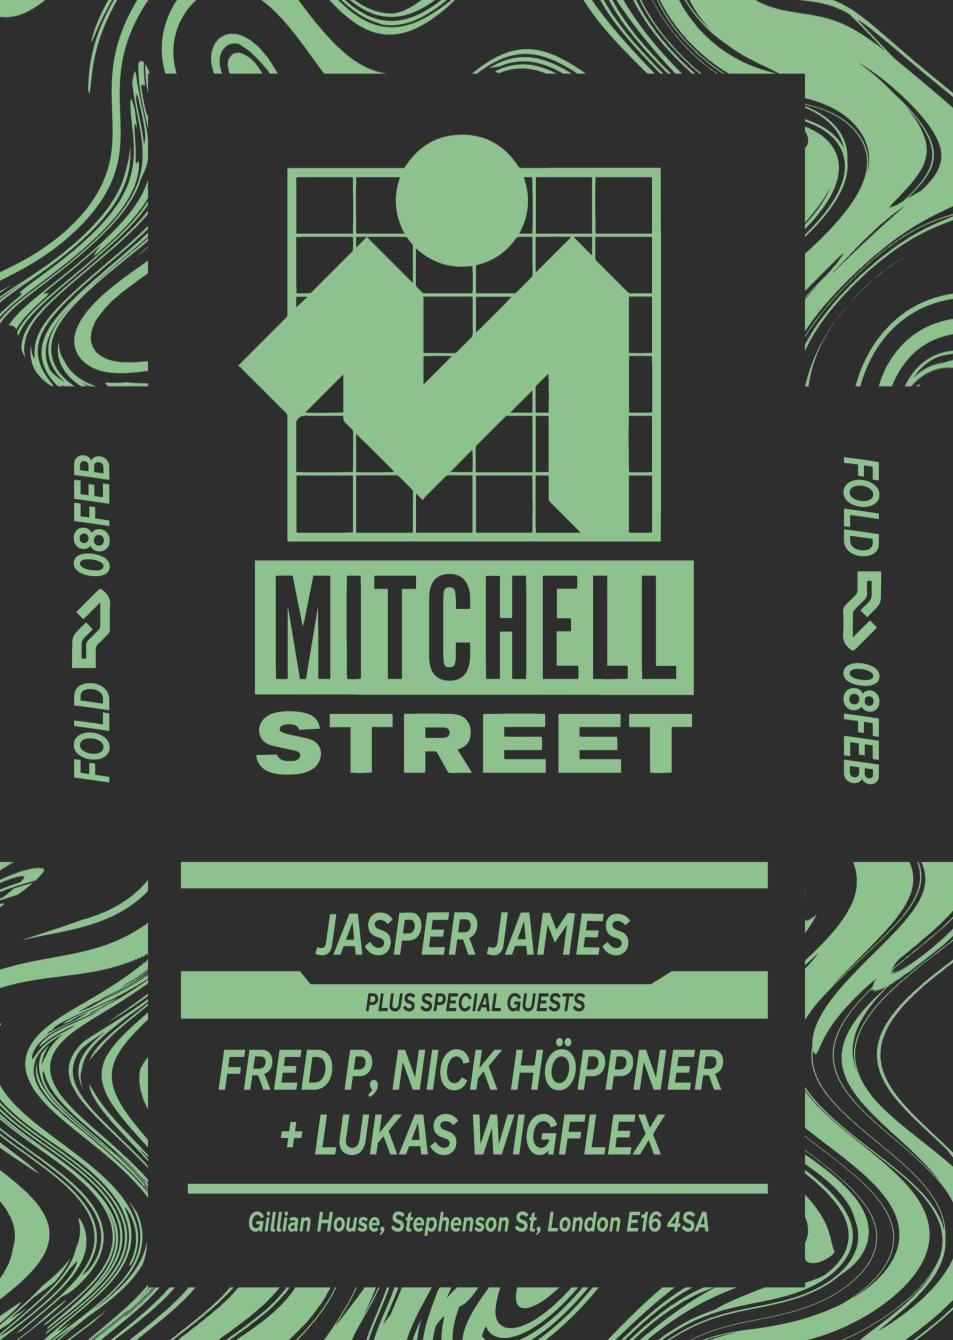 Mitchell Street presents Jasper James, Fred P, Nick Höppner and Lukas Wigflex - Flyer front